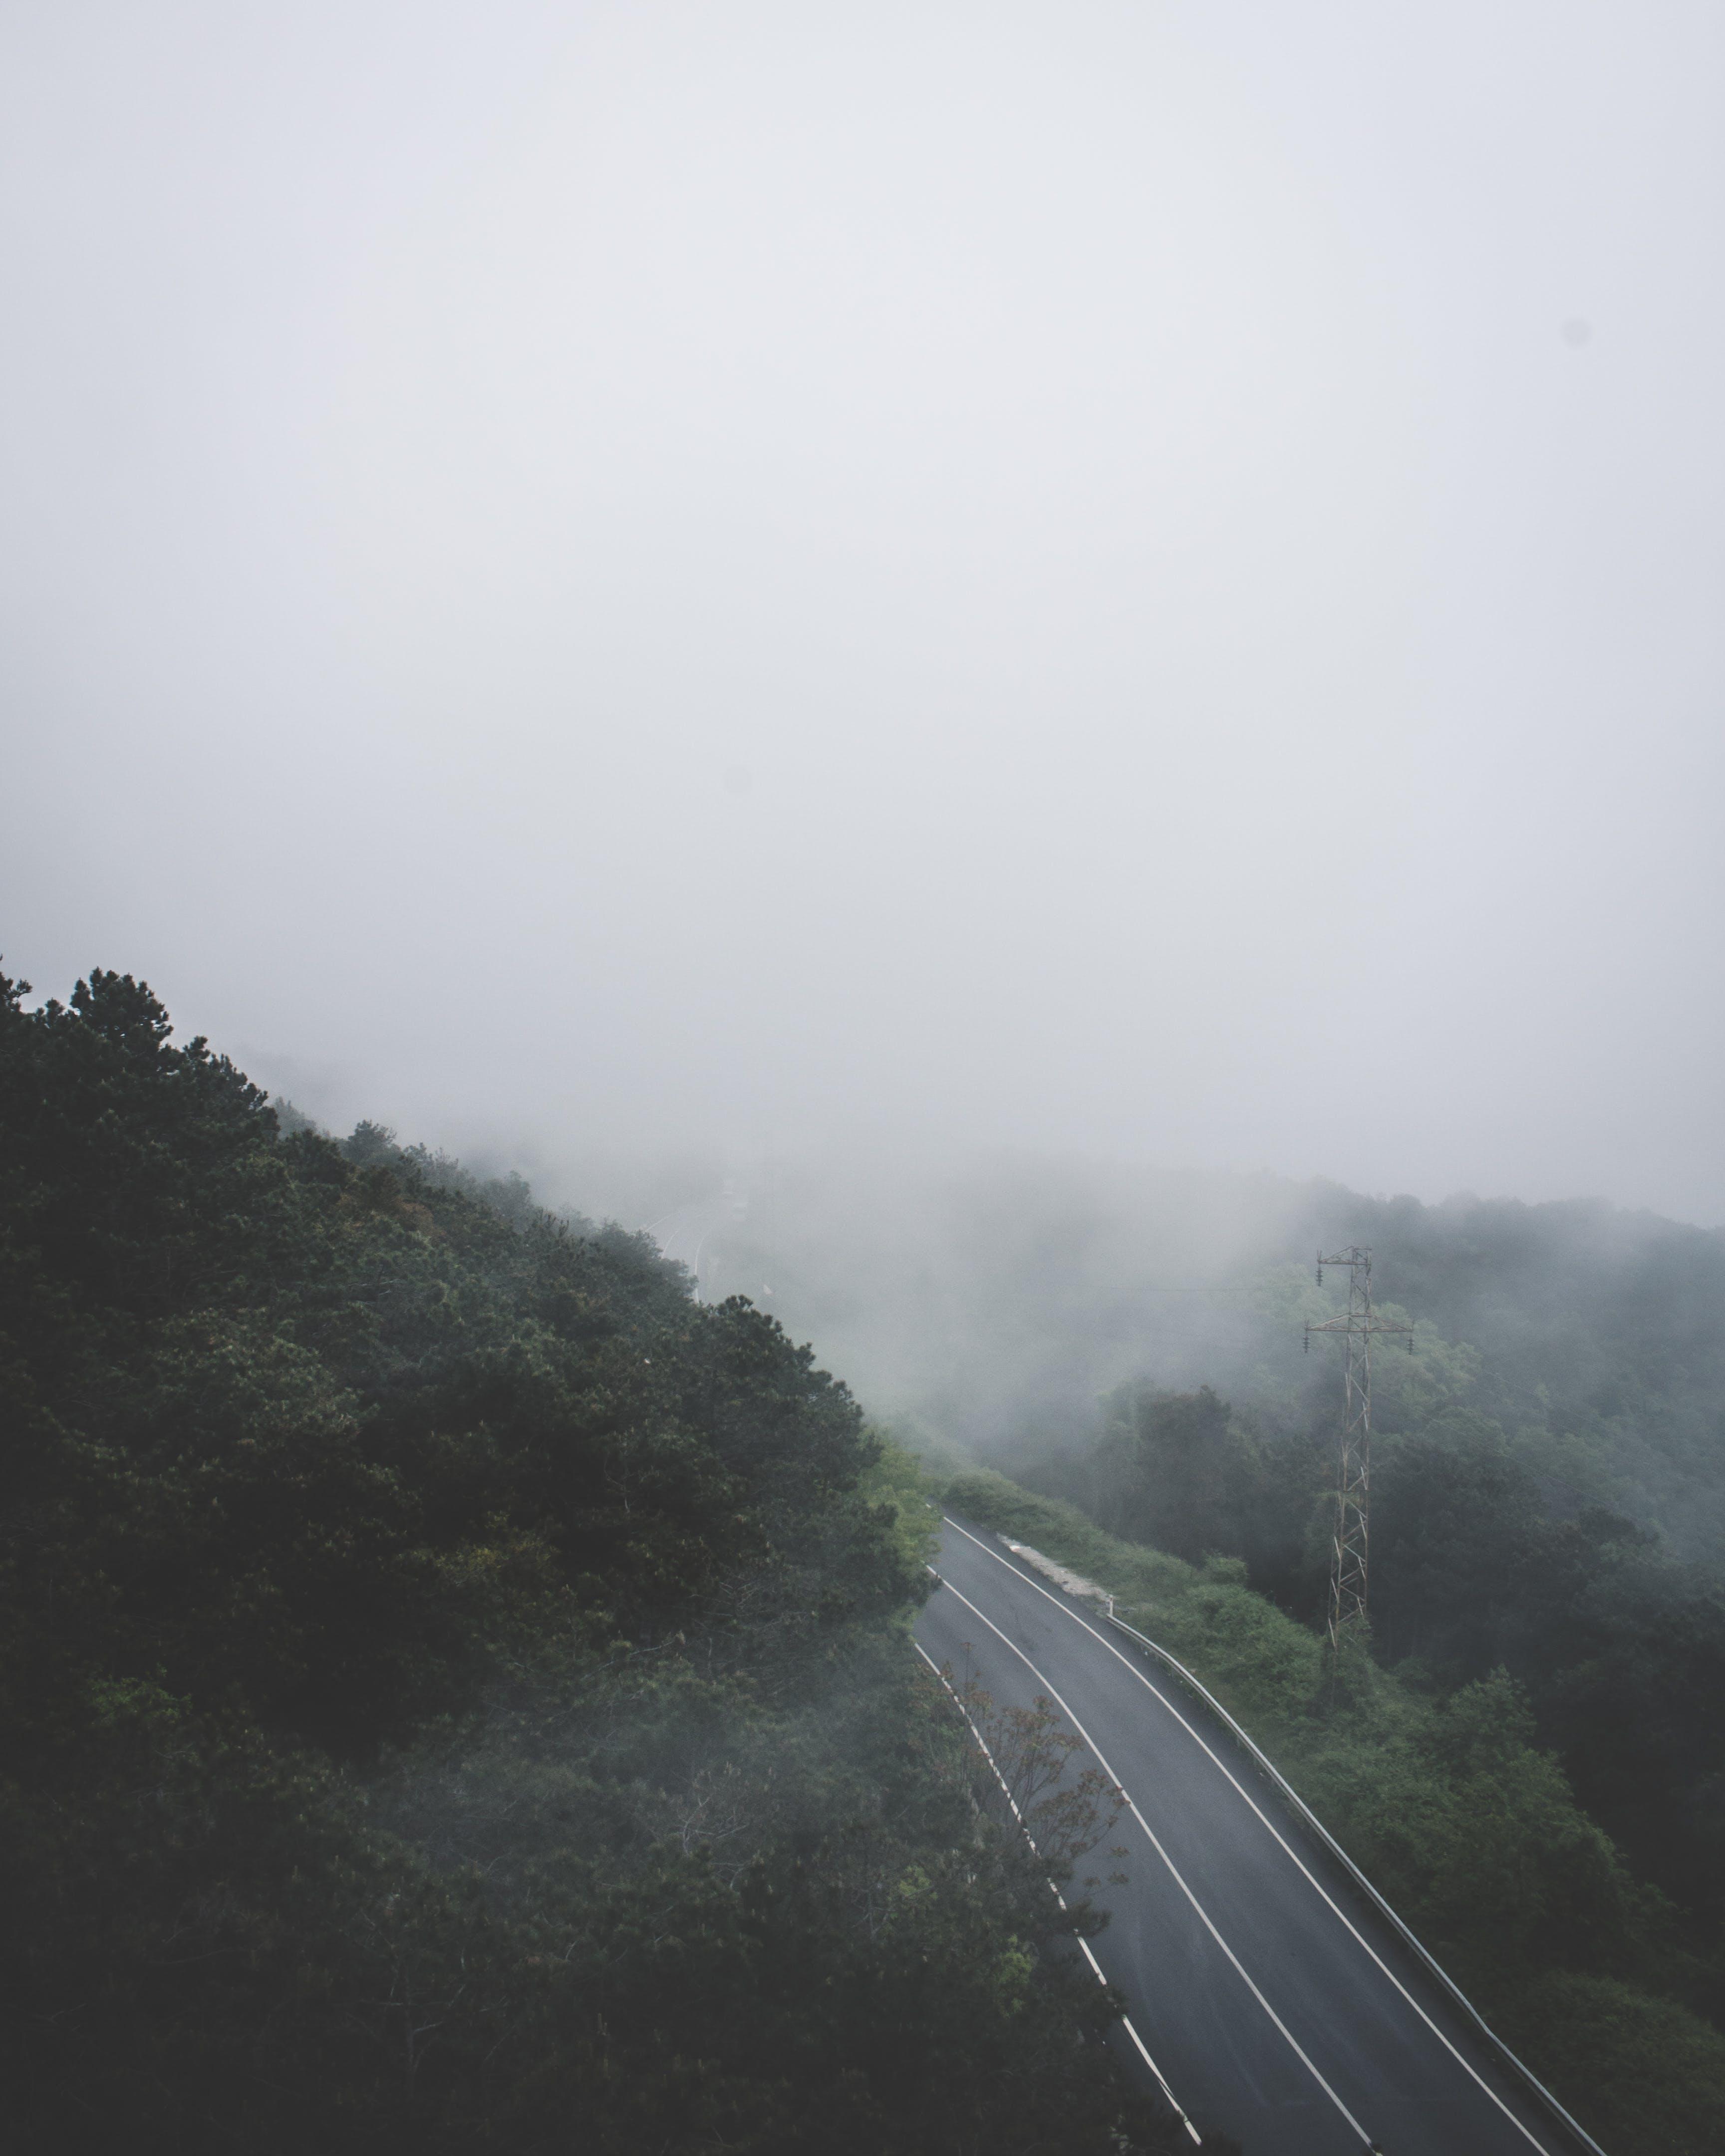 Kostenloses Stock Foto zu asphalt, ausflug), autobahn, bäume